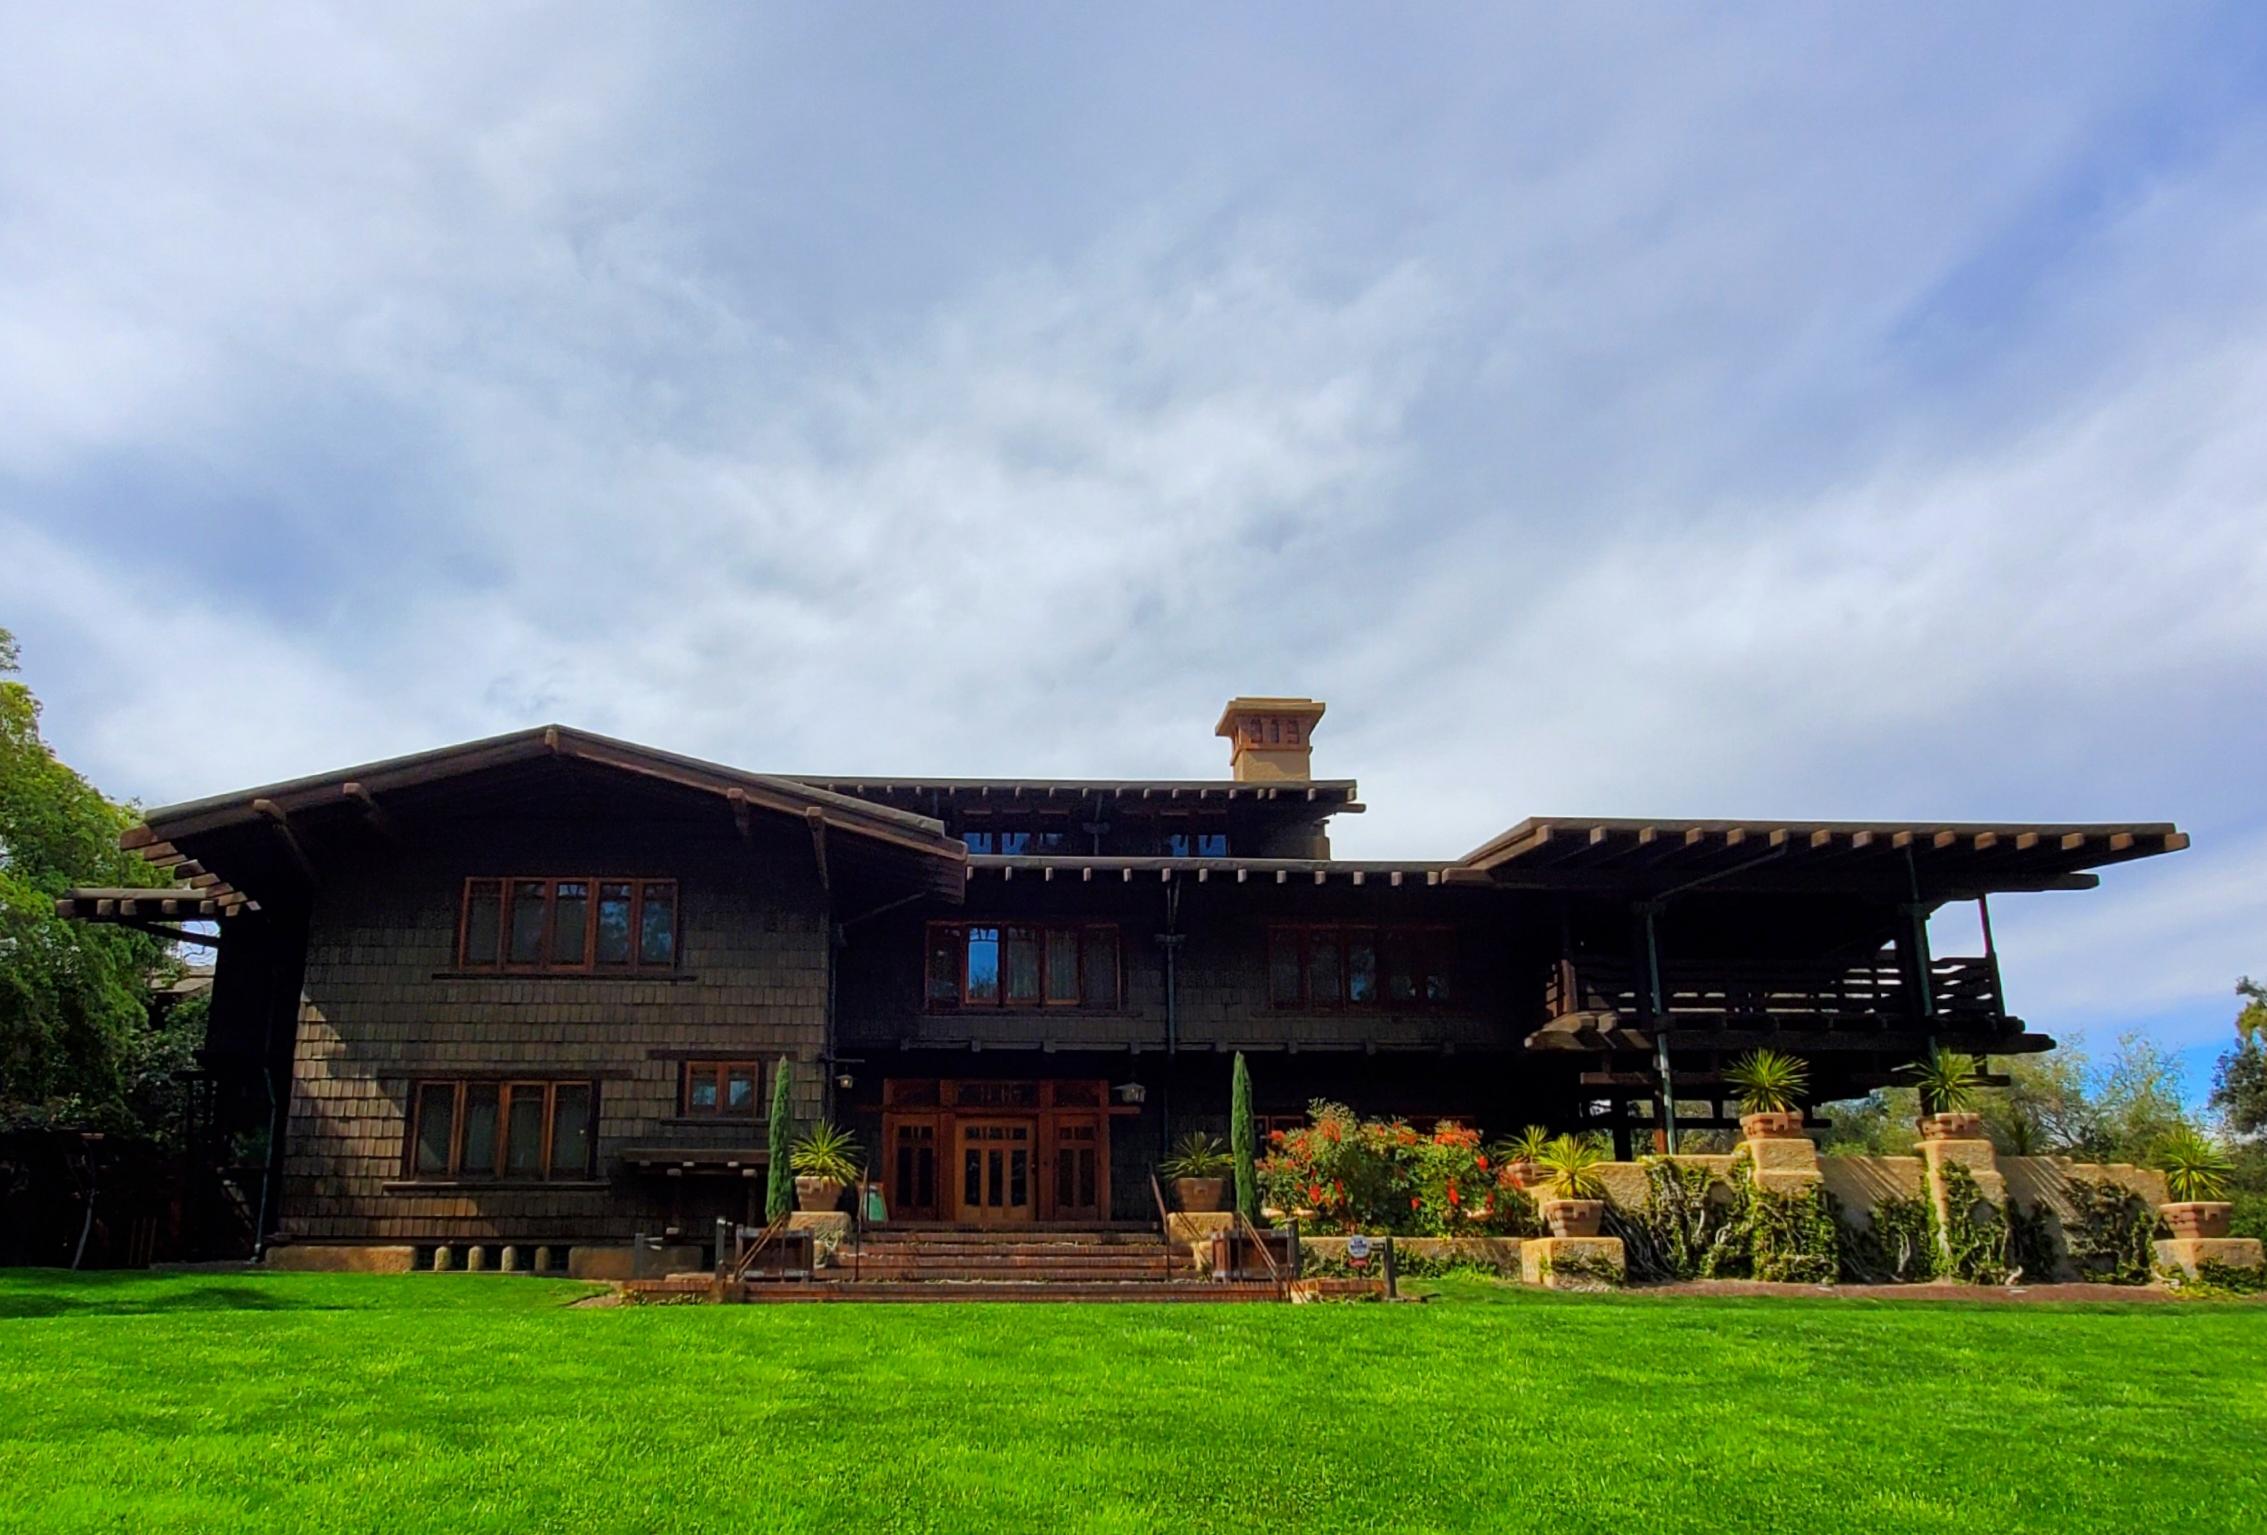 Pasadena Gamble Home